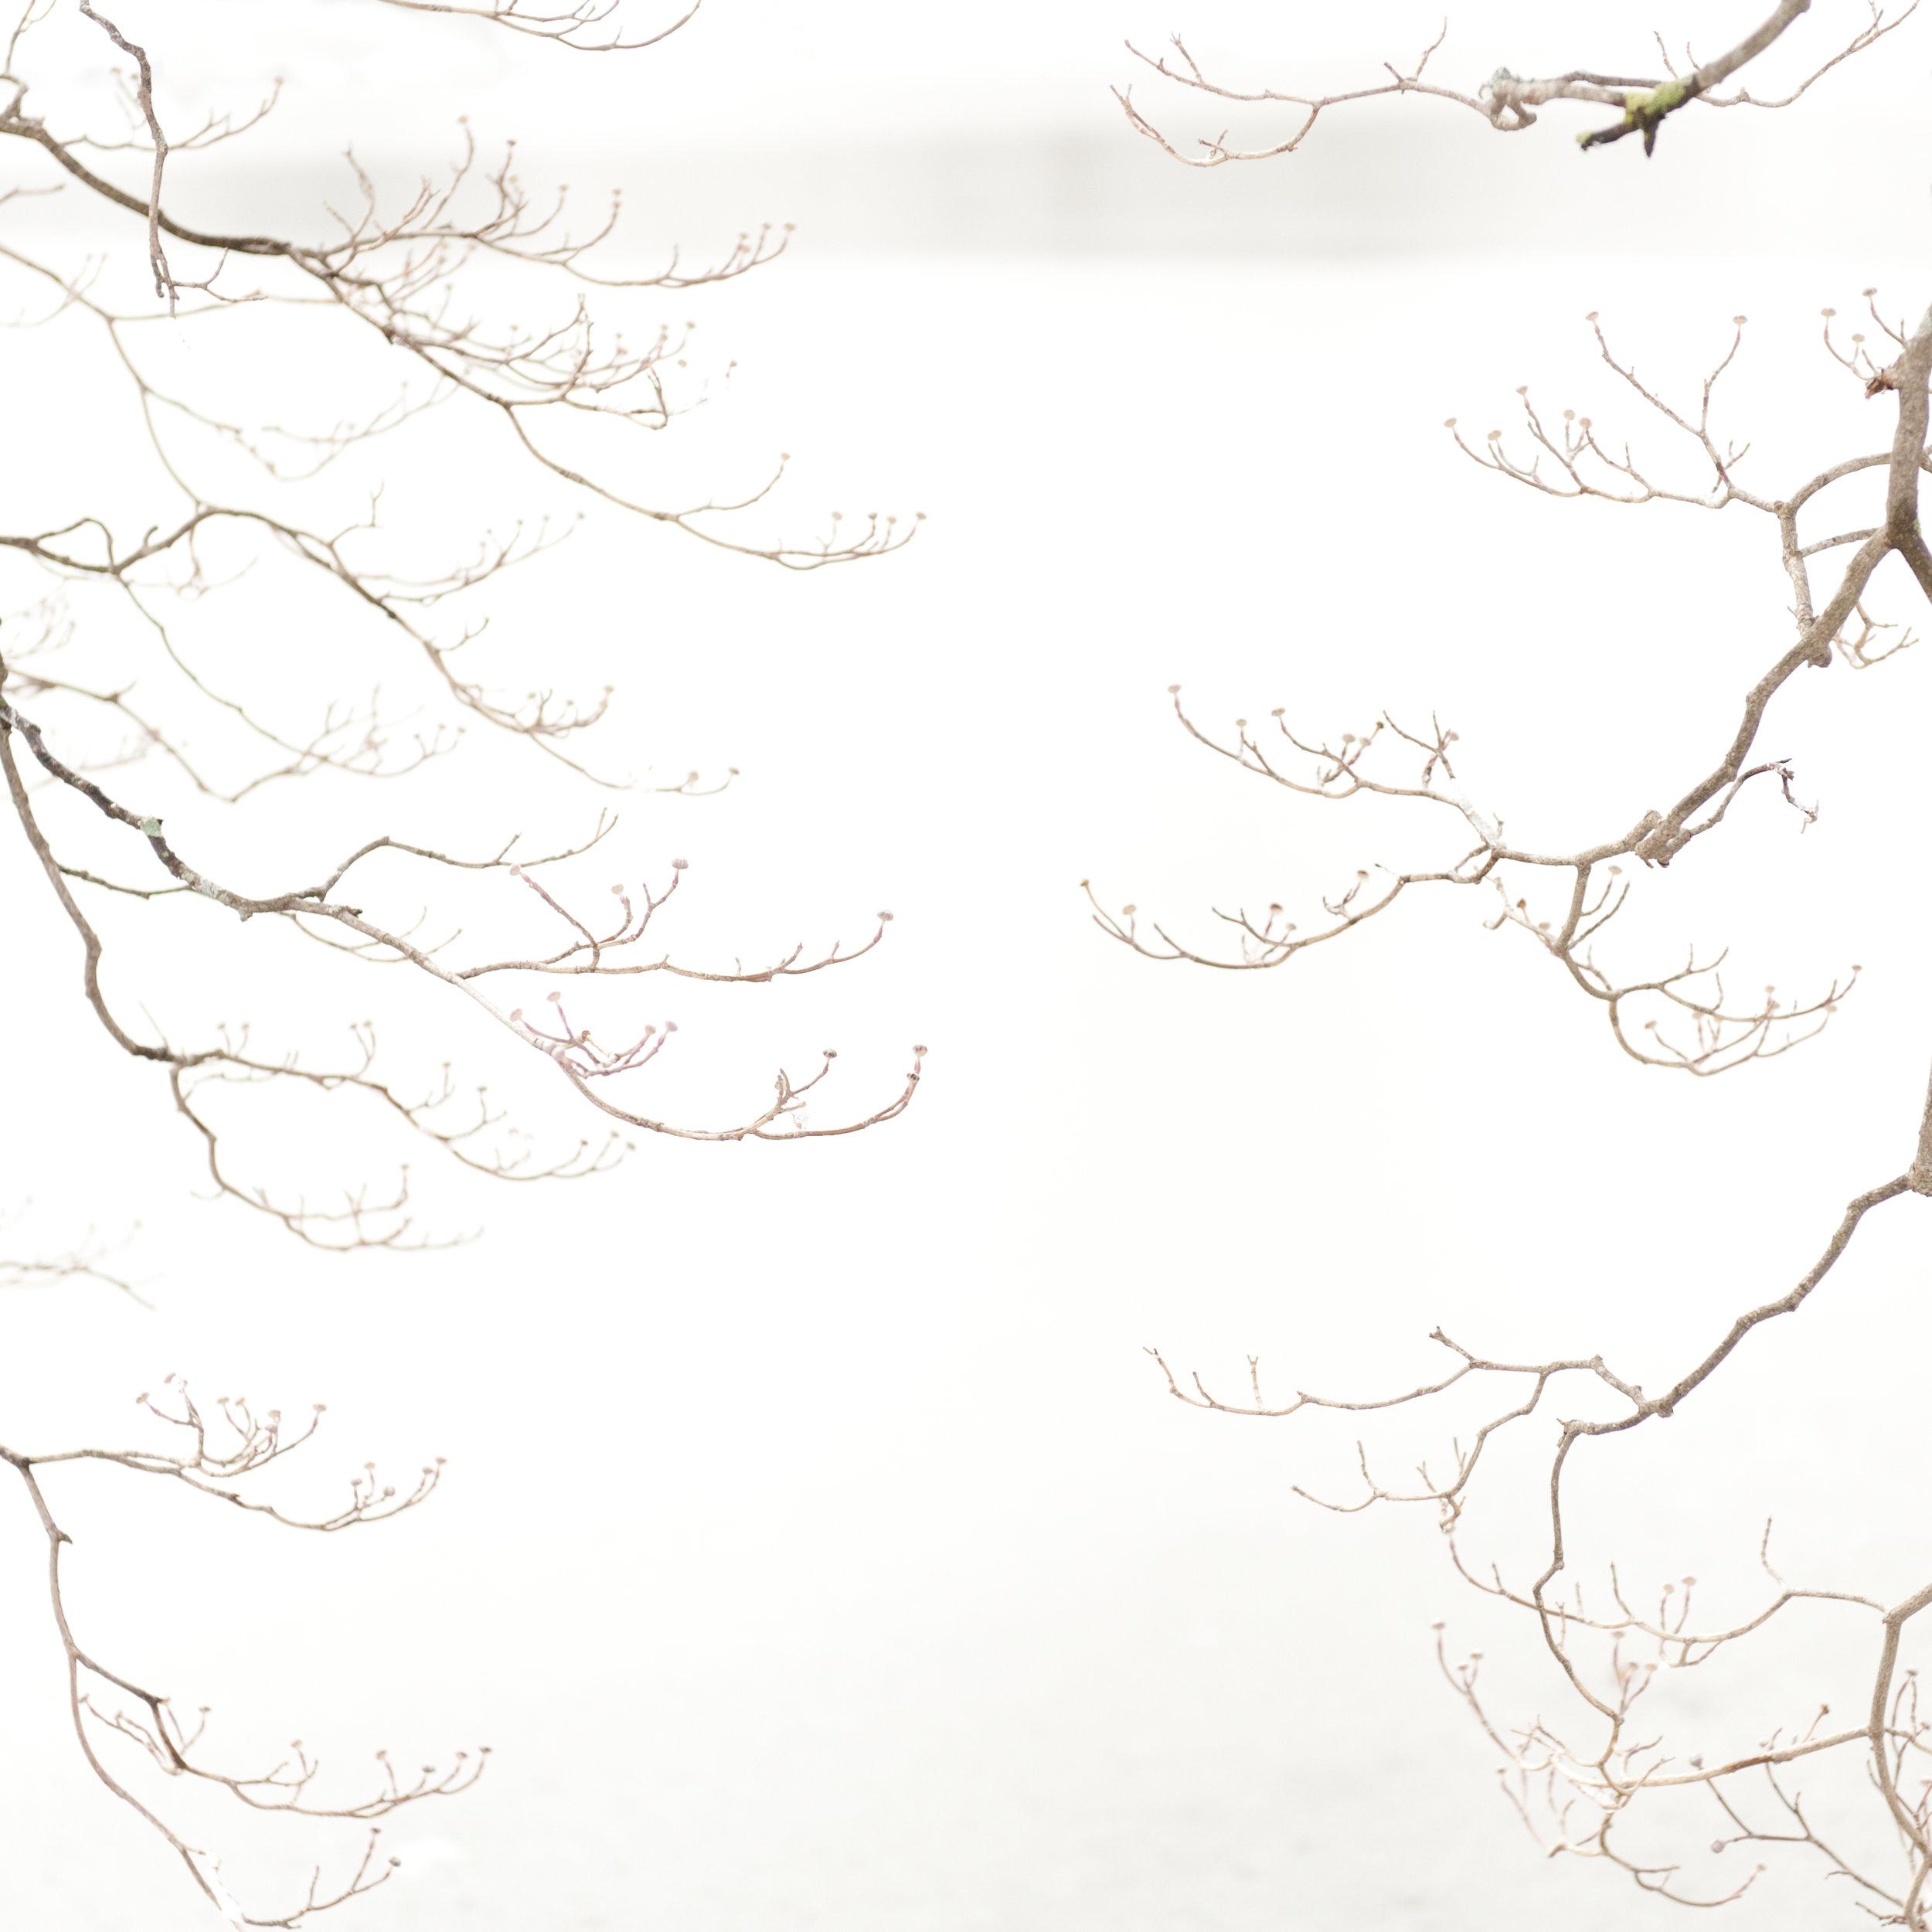 Study in Snow, Dogwood Tree, 6